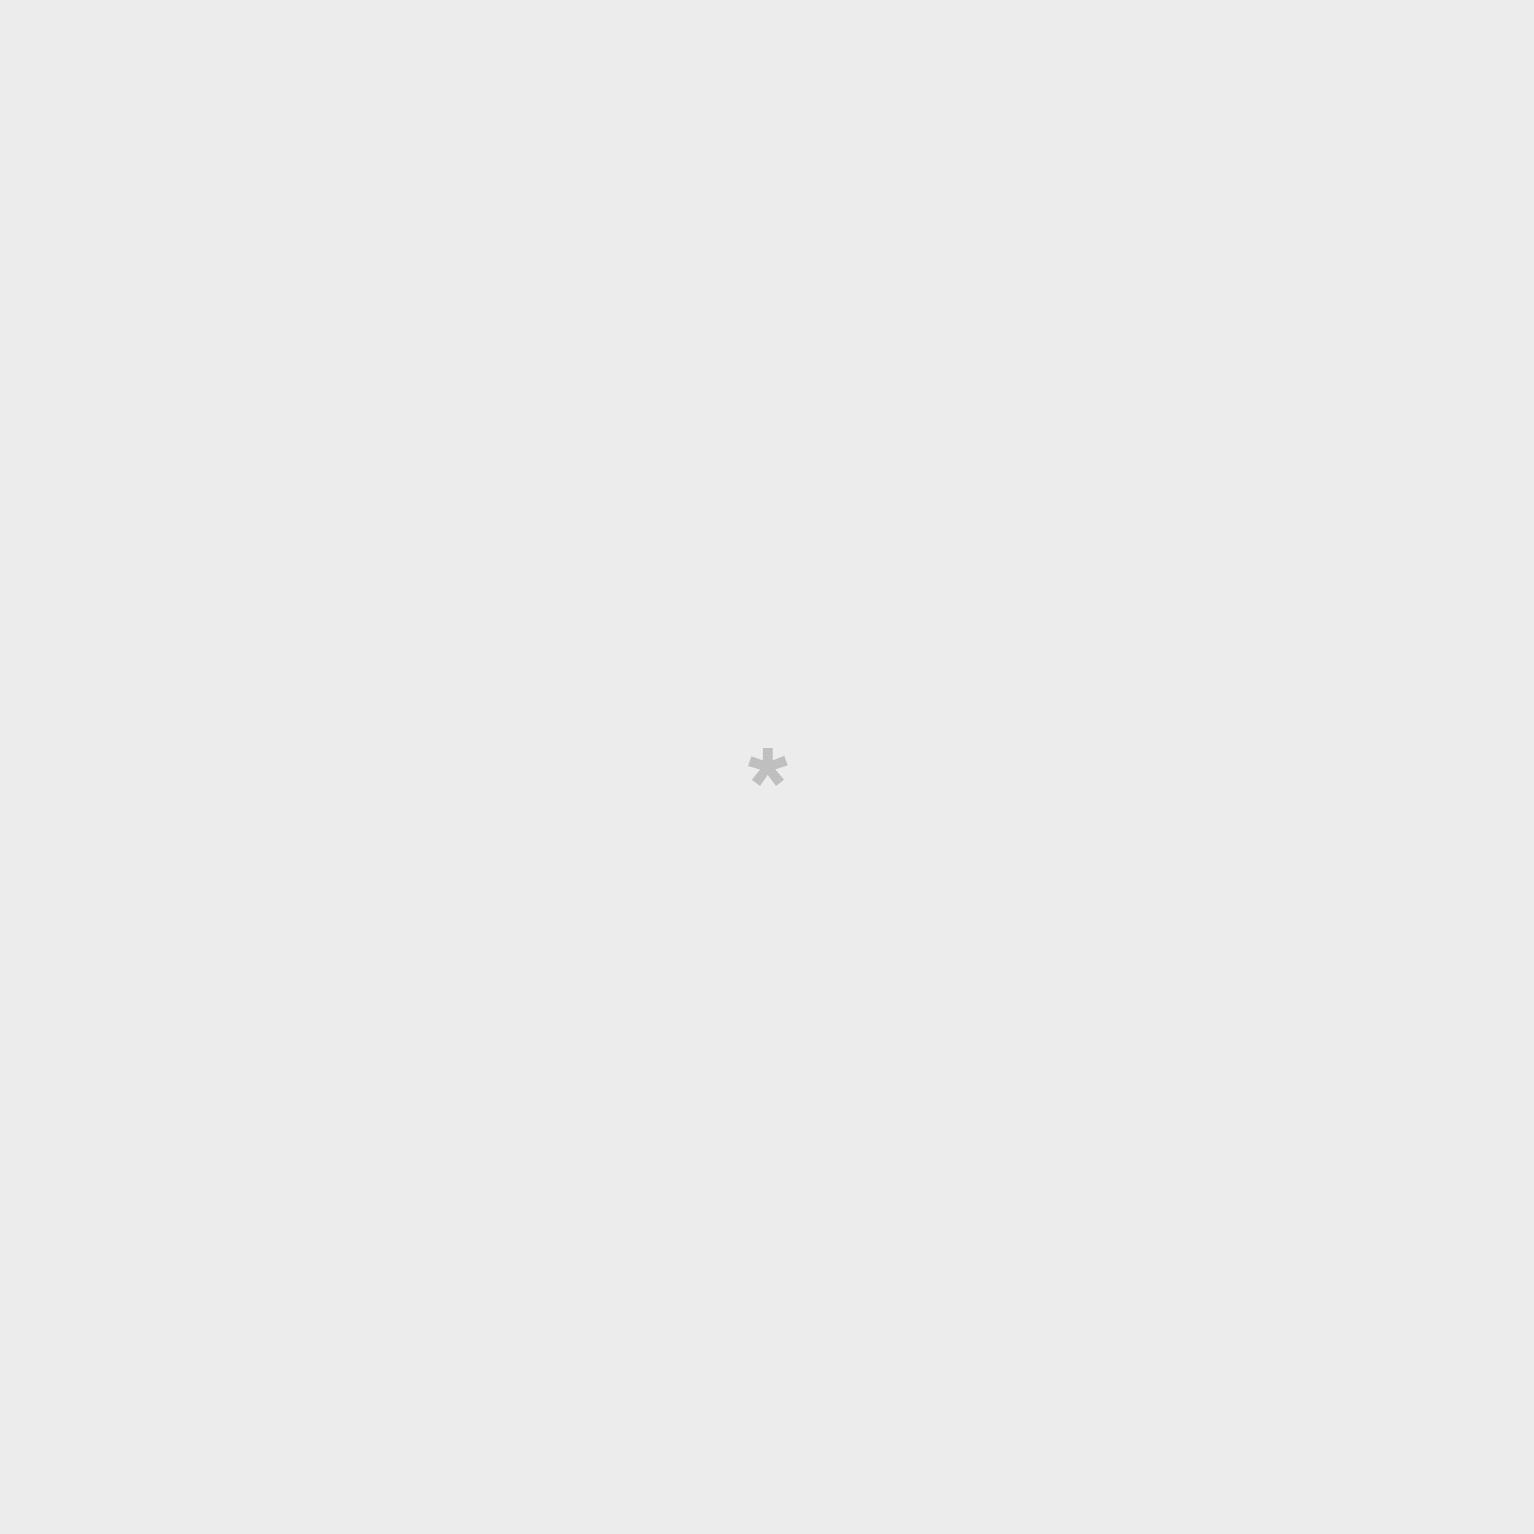 Bougie senteur - Moment spécial  - Relax Tea (FR)